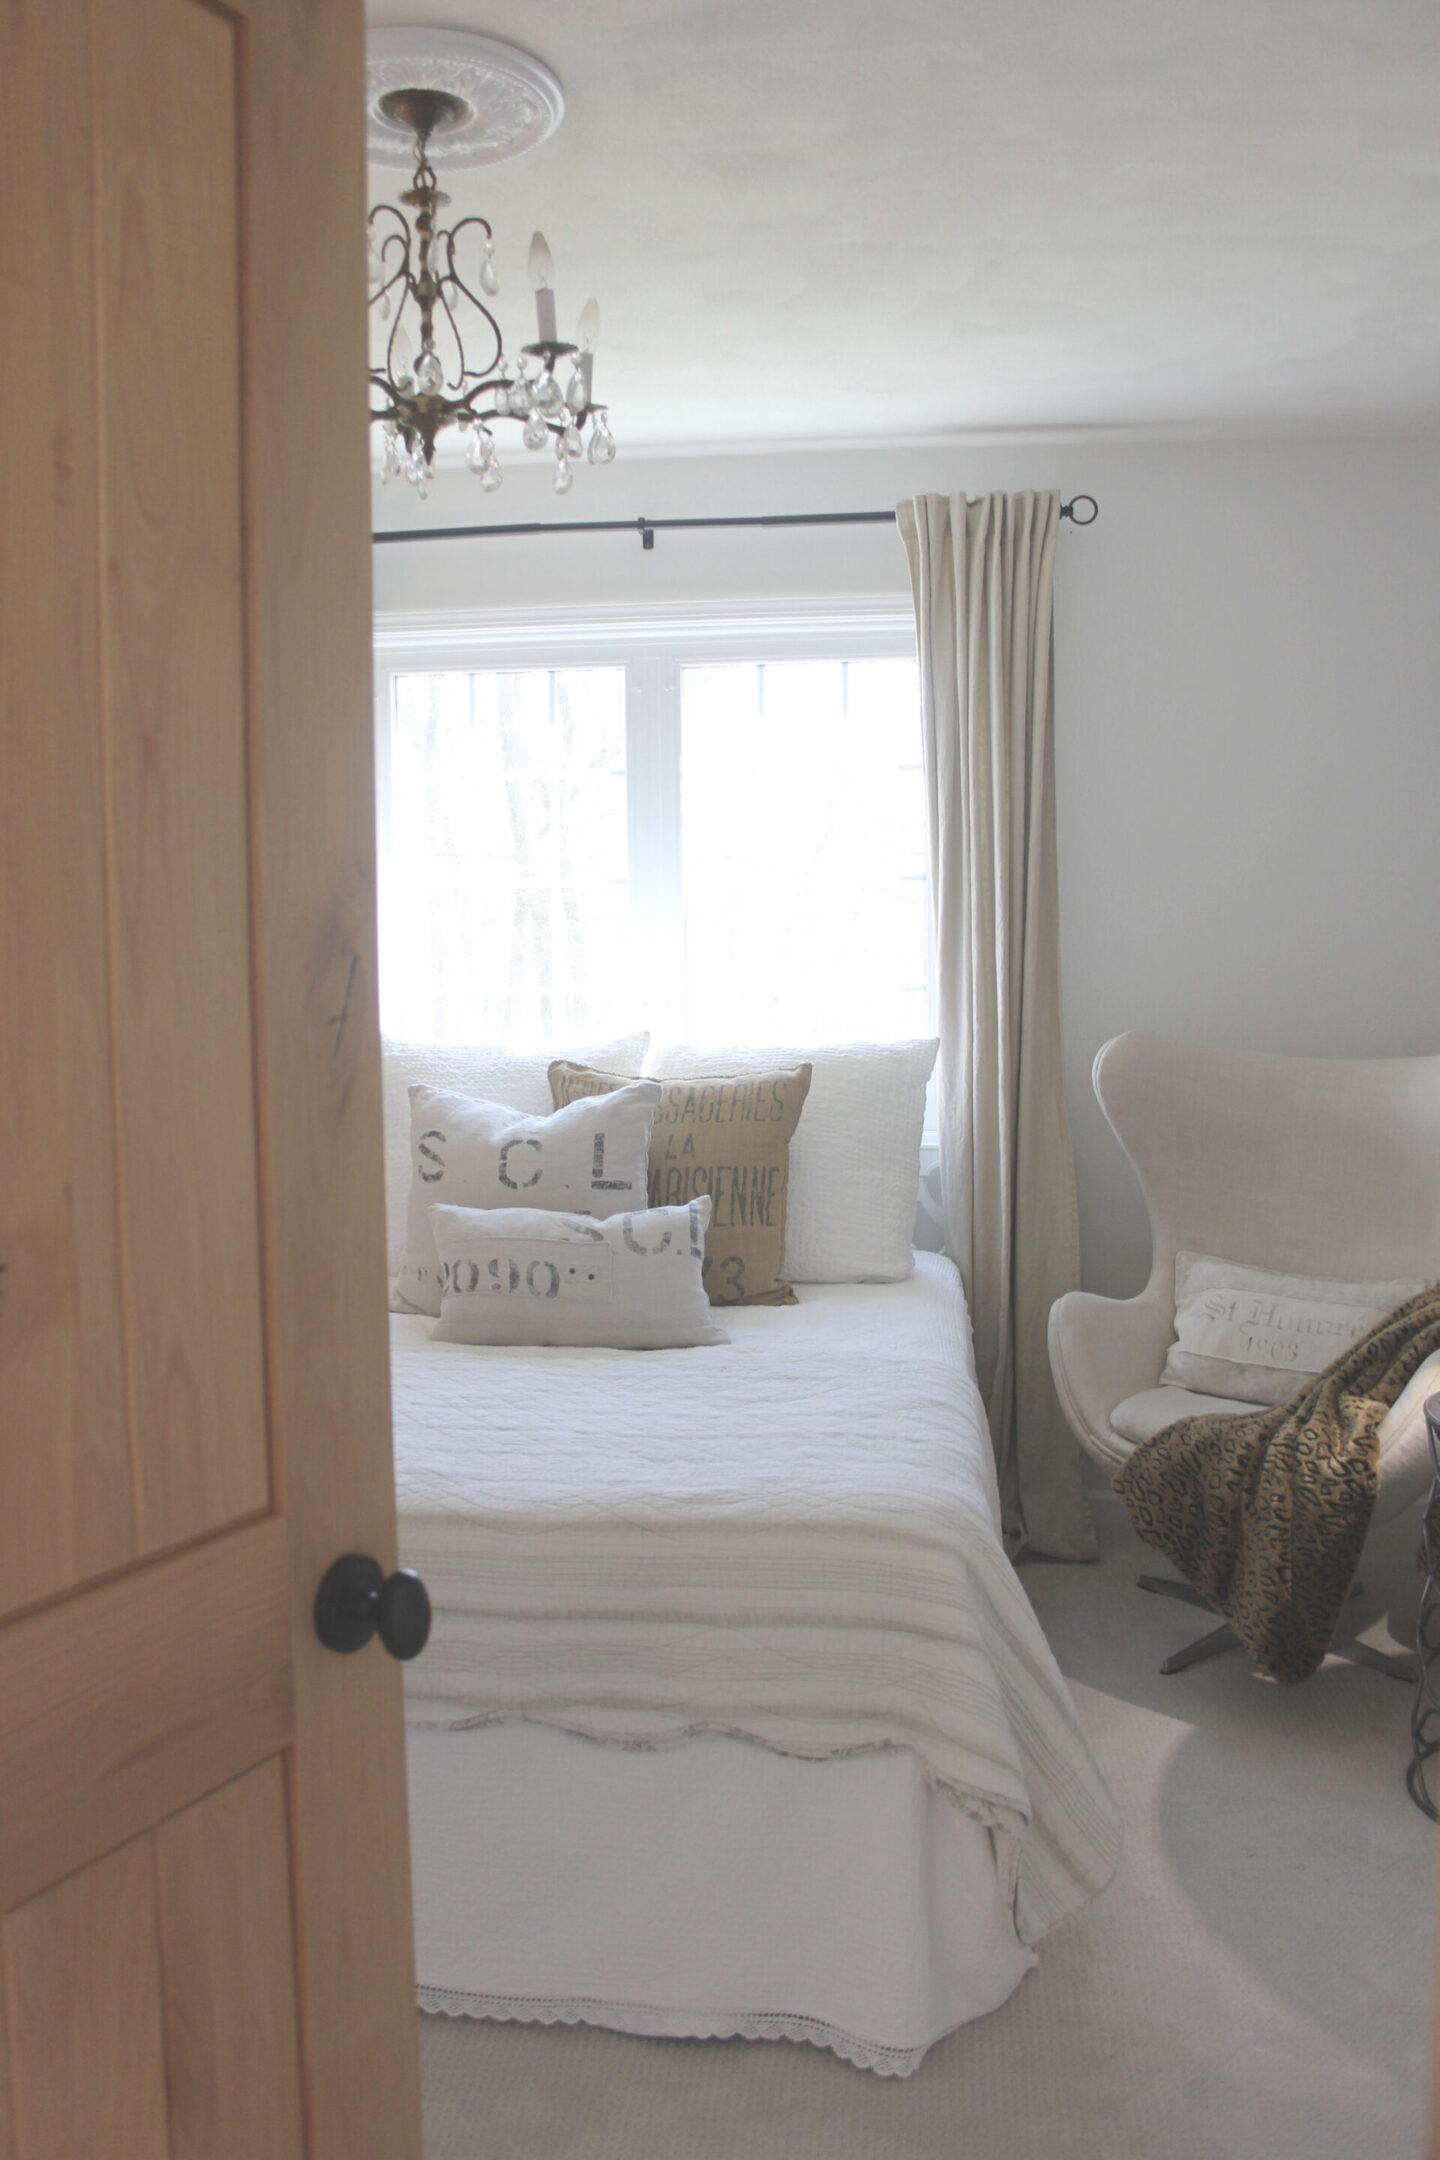 Calm, simple, neutral white bedroom at our fixer upper painted Benjamin Moore White - Hello Lovely Studio. #alderdoor #interiordesign #bedroom